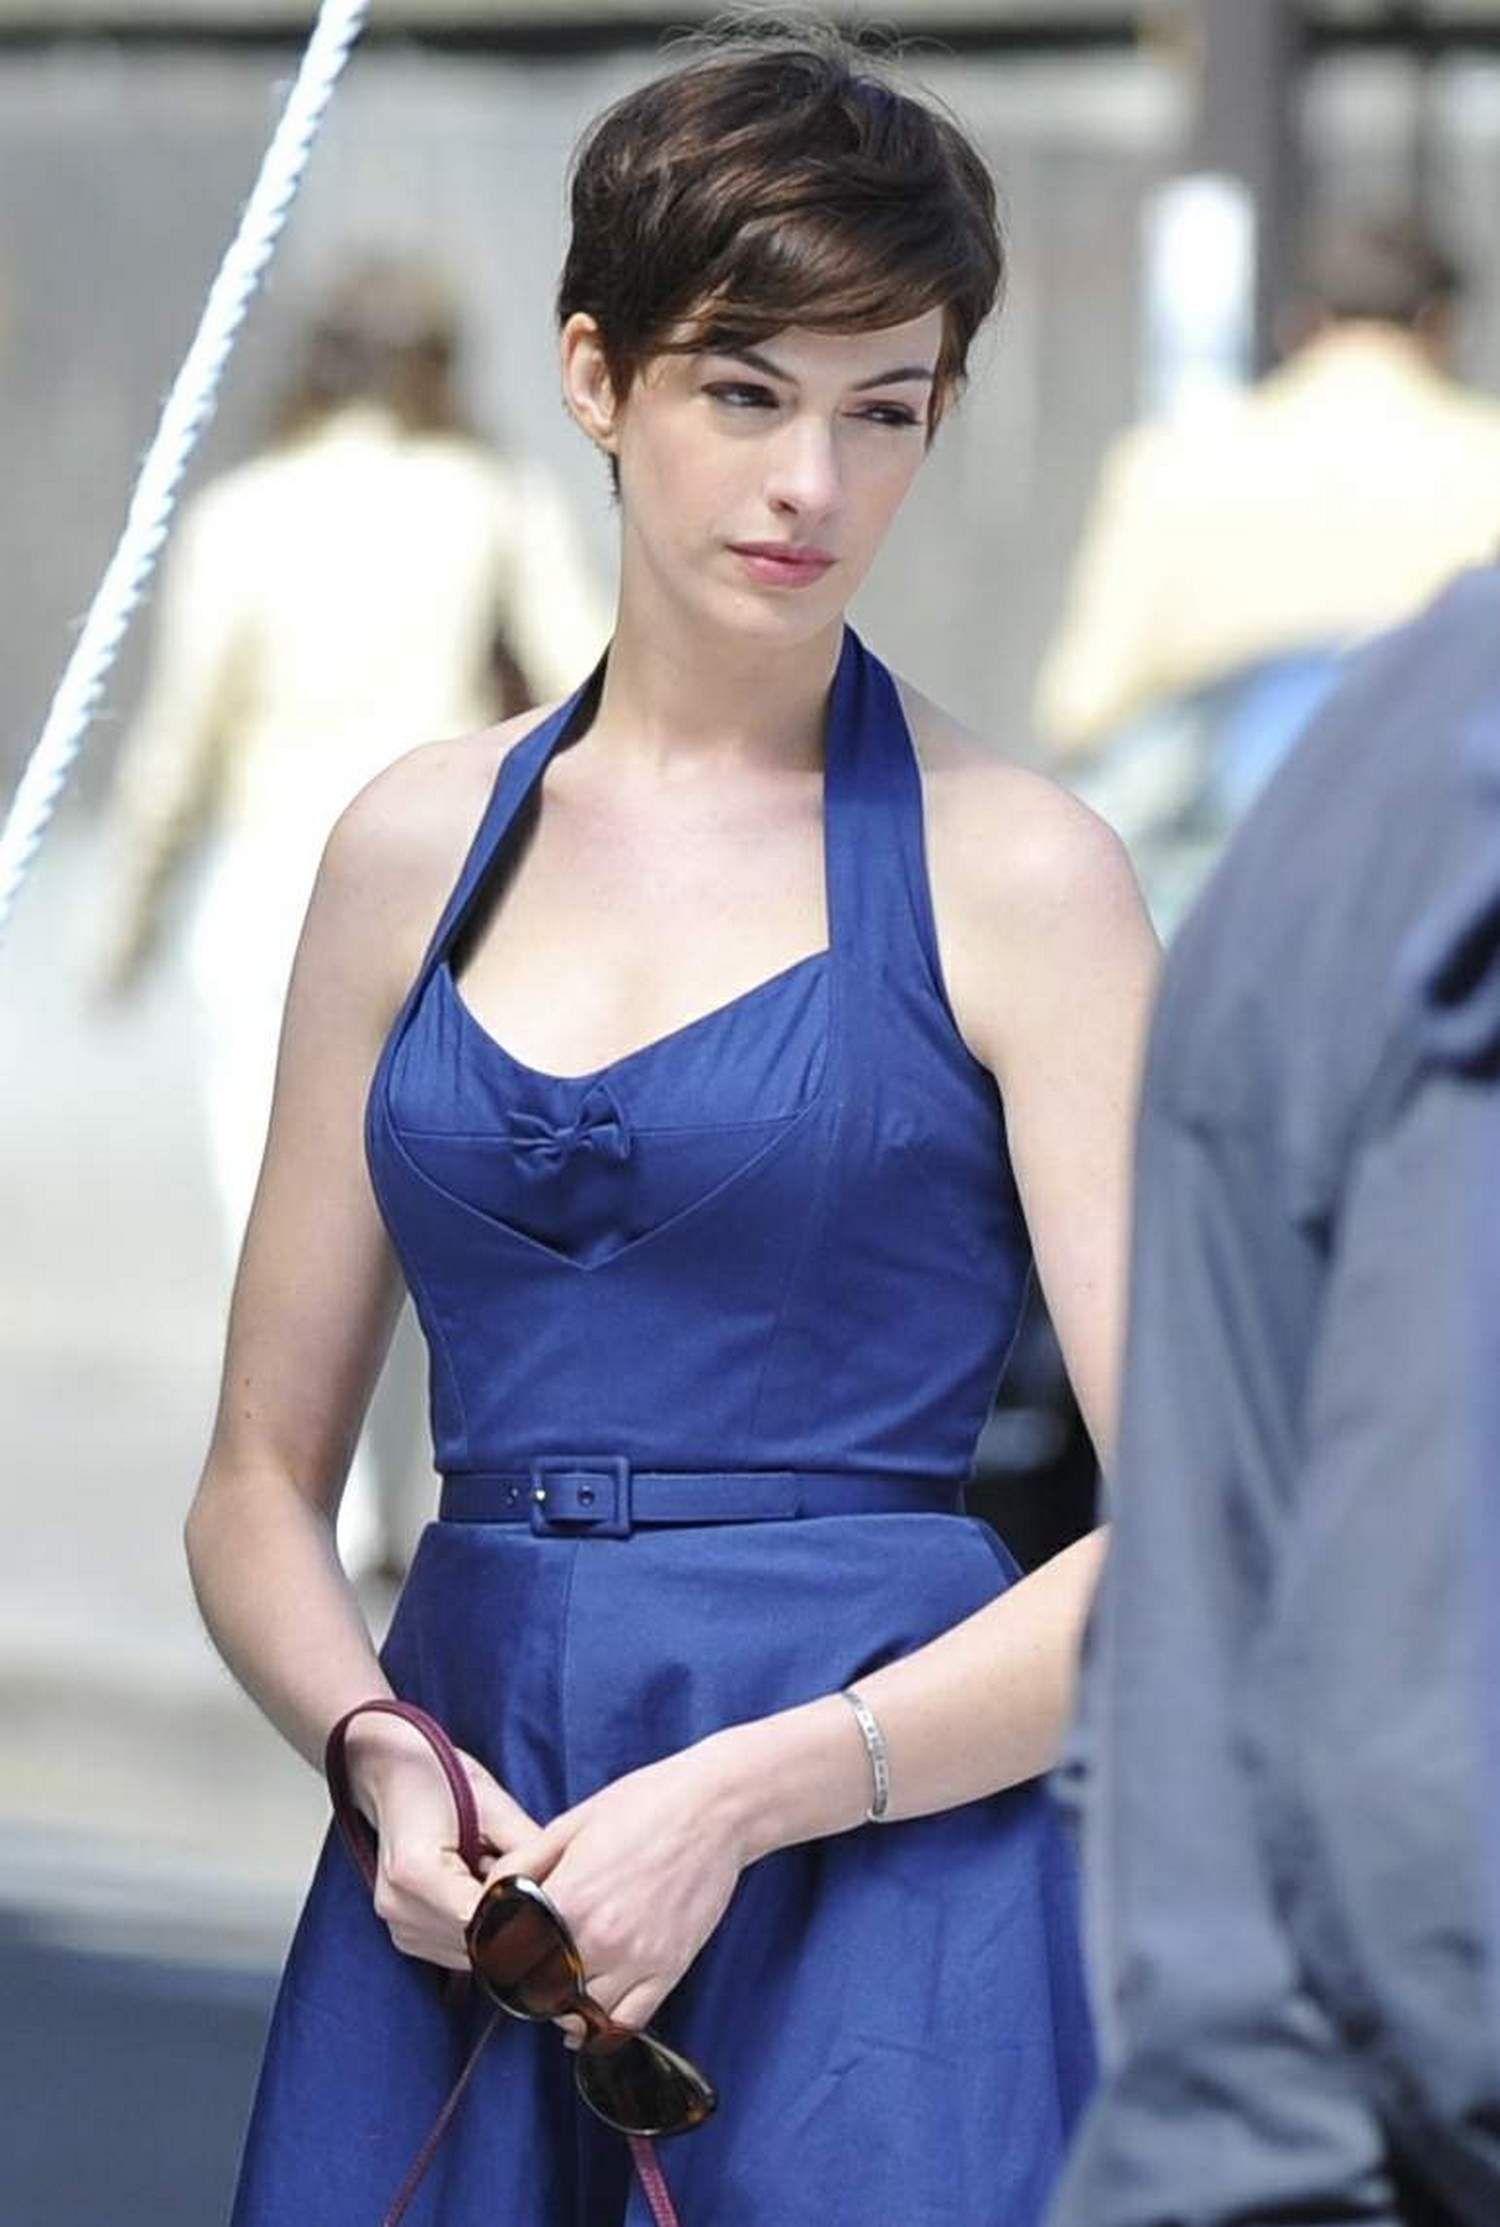 Anne Hathaway 2 Jpg 1 500 2 227 Pixels Anne Hathaway Hair Anne Hathaway Short Hair Anne Hathaway